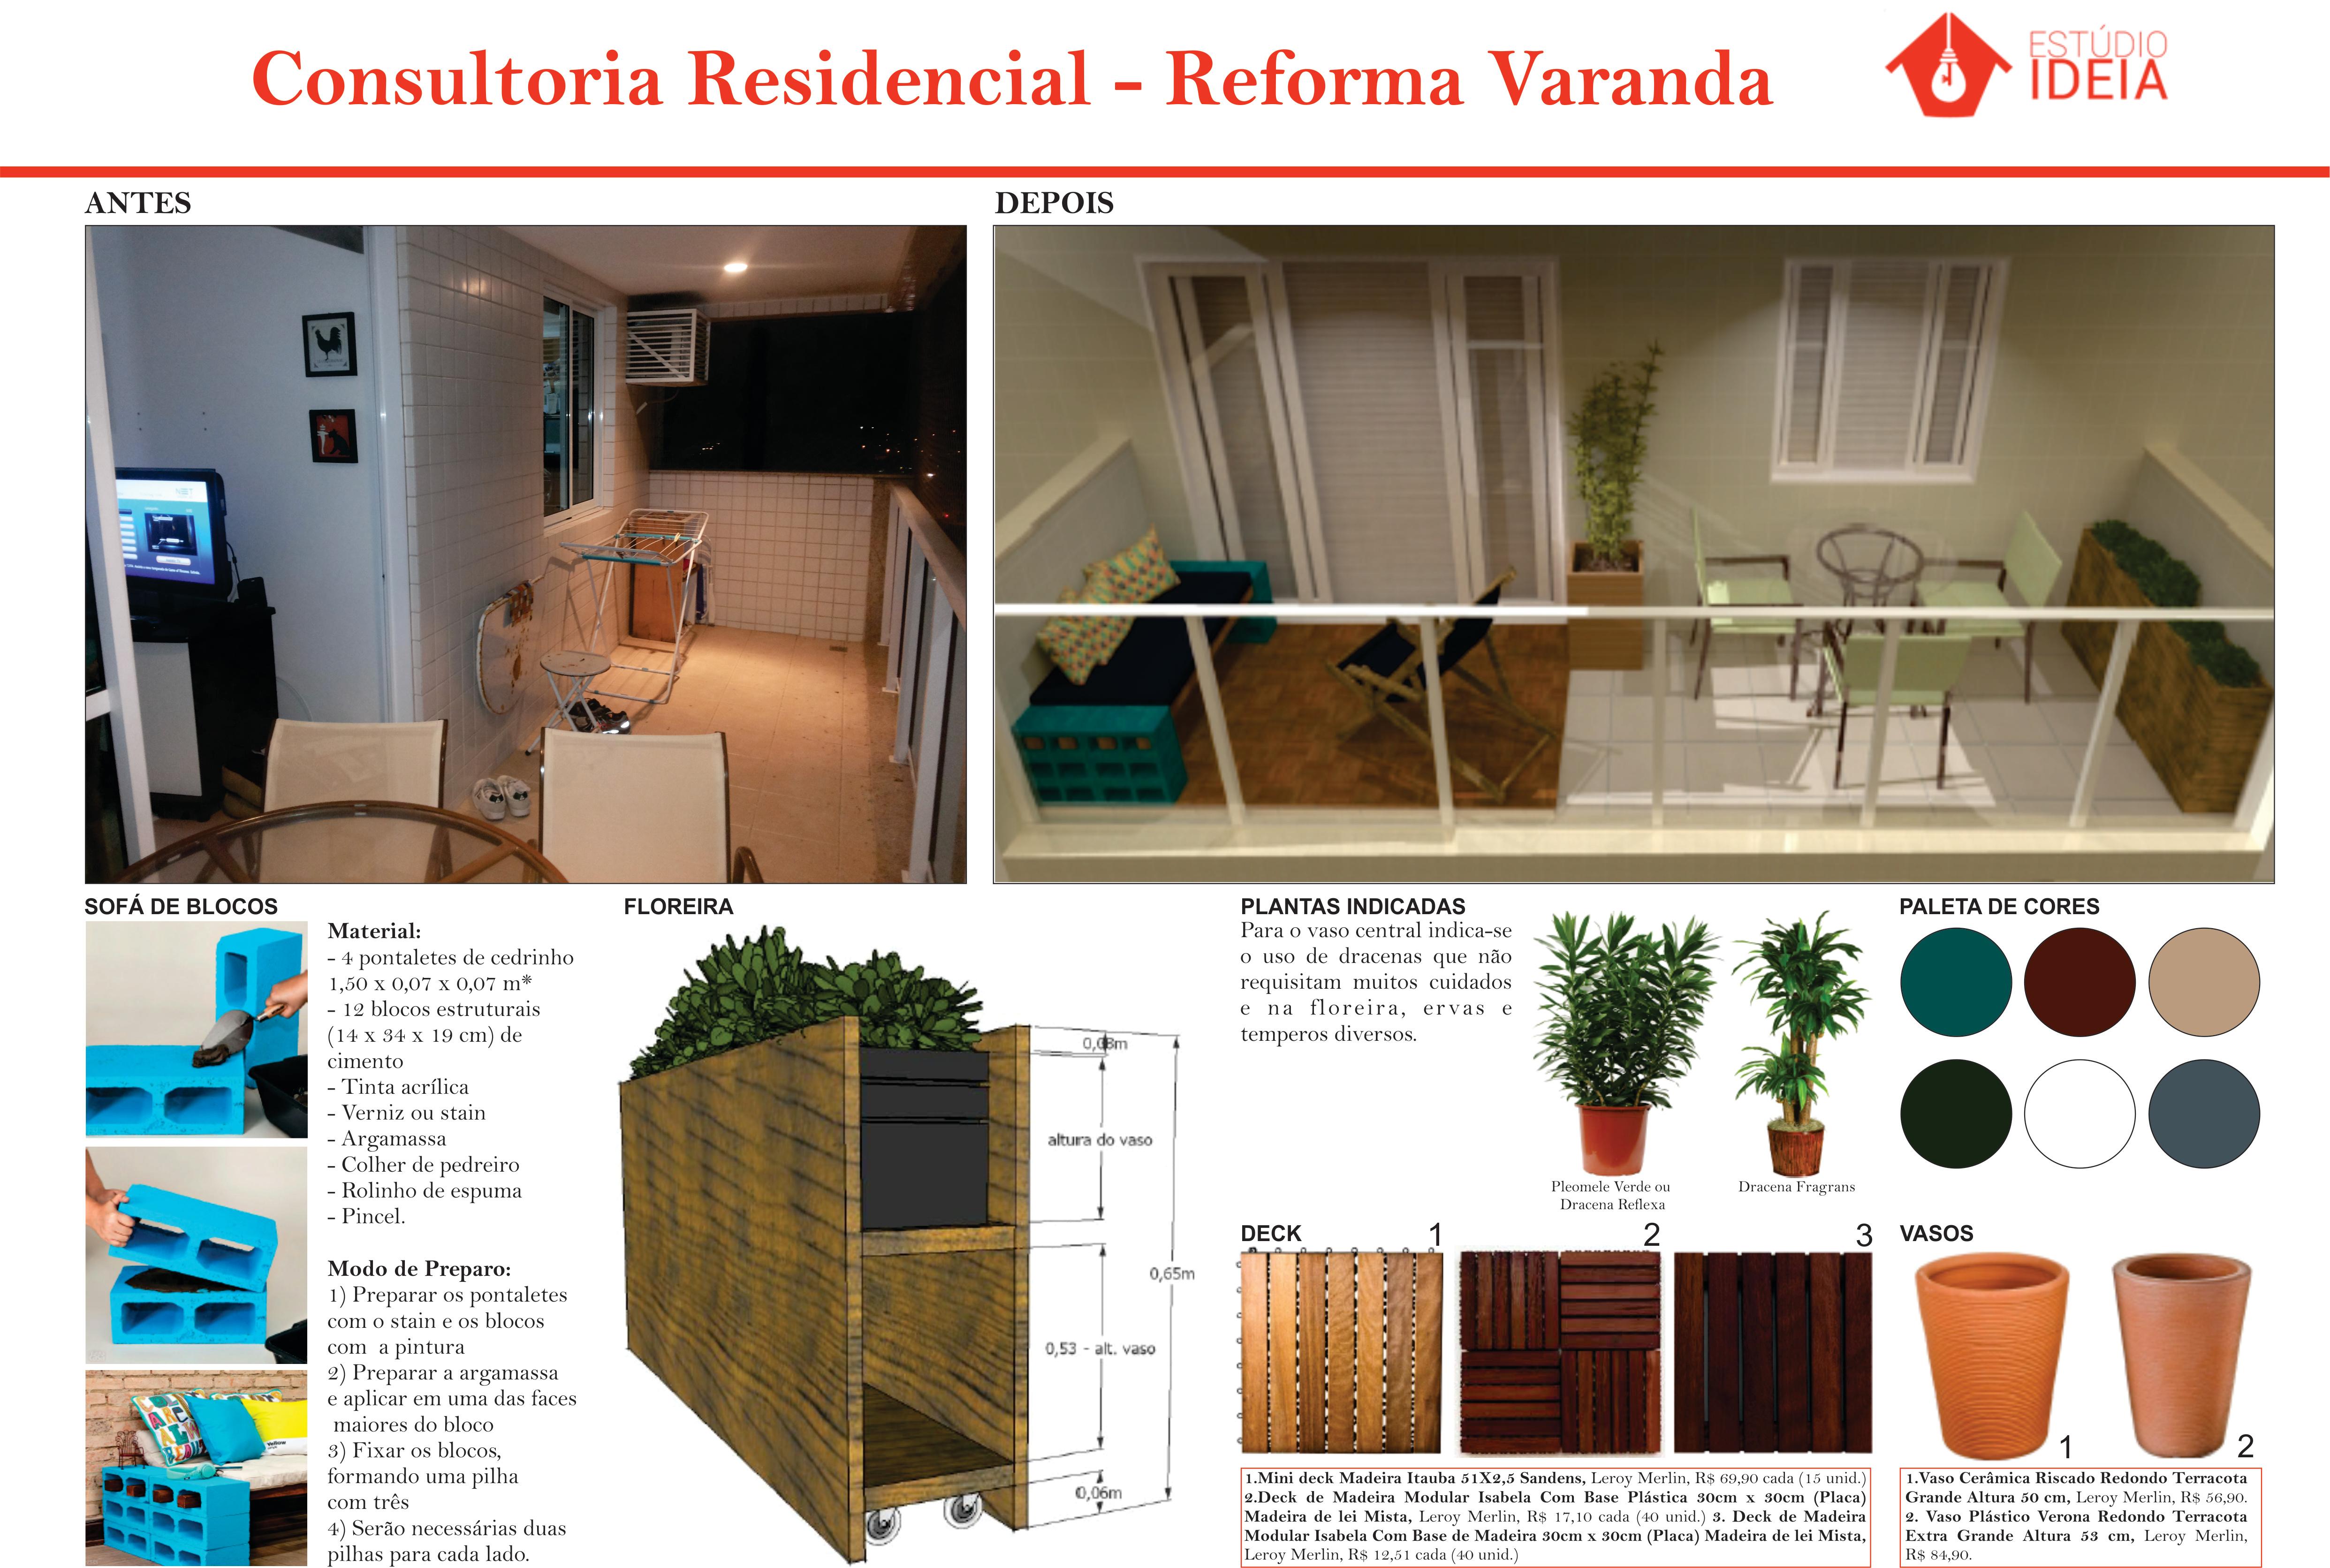 Consultoria Residencial